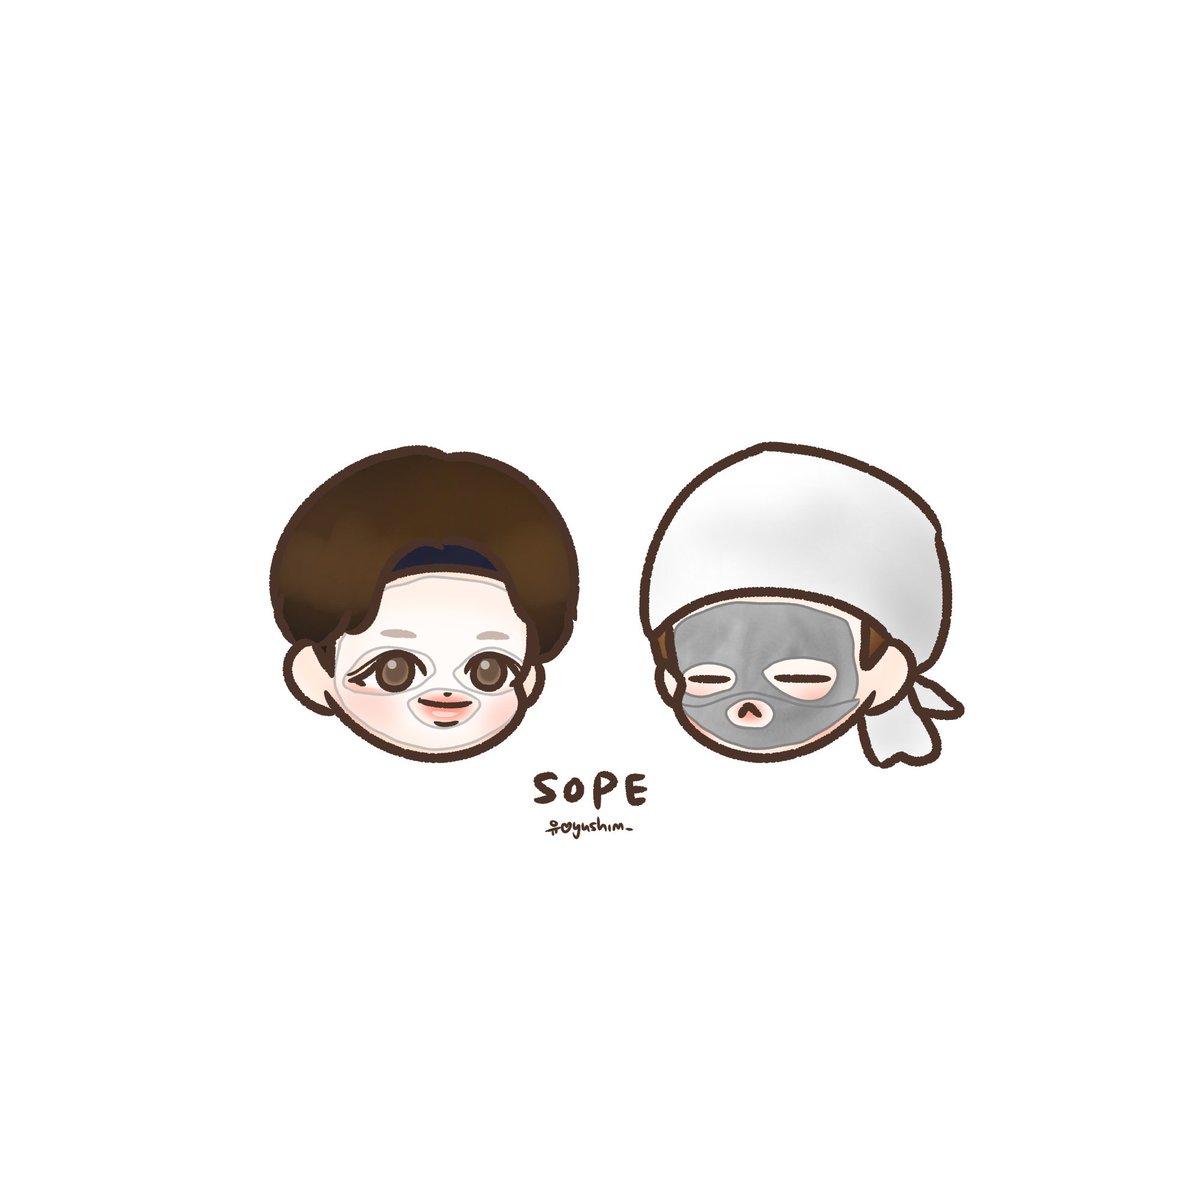 SOPE x sheet mask #호석 #윤기 #솝 #jhope #yoongi<br>http://pic.twitter.com/BMTJRbAOQW